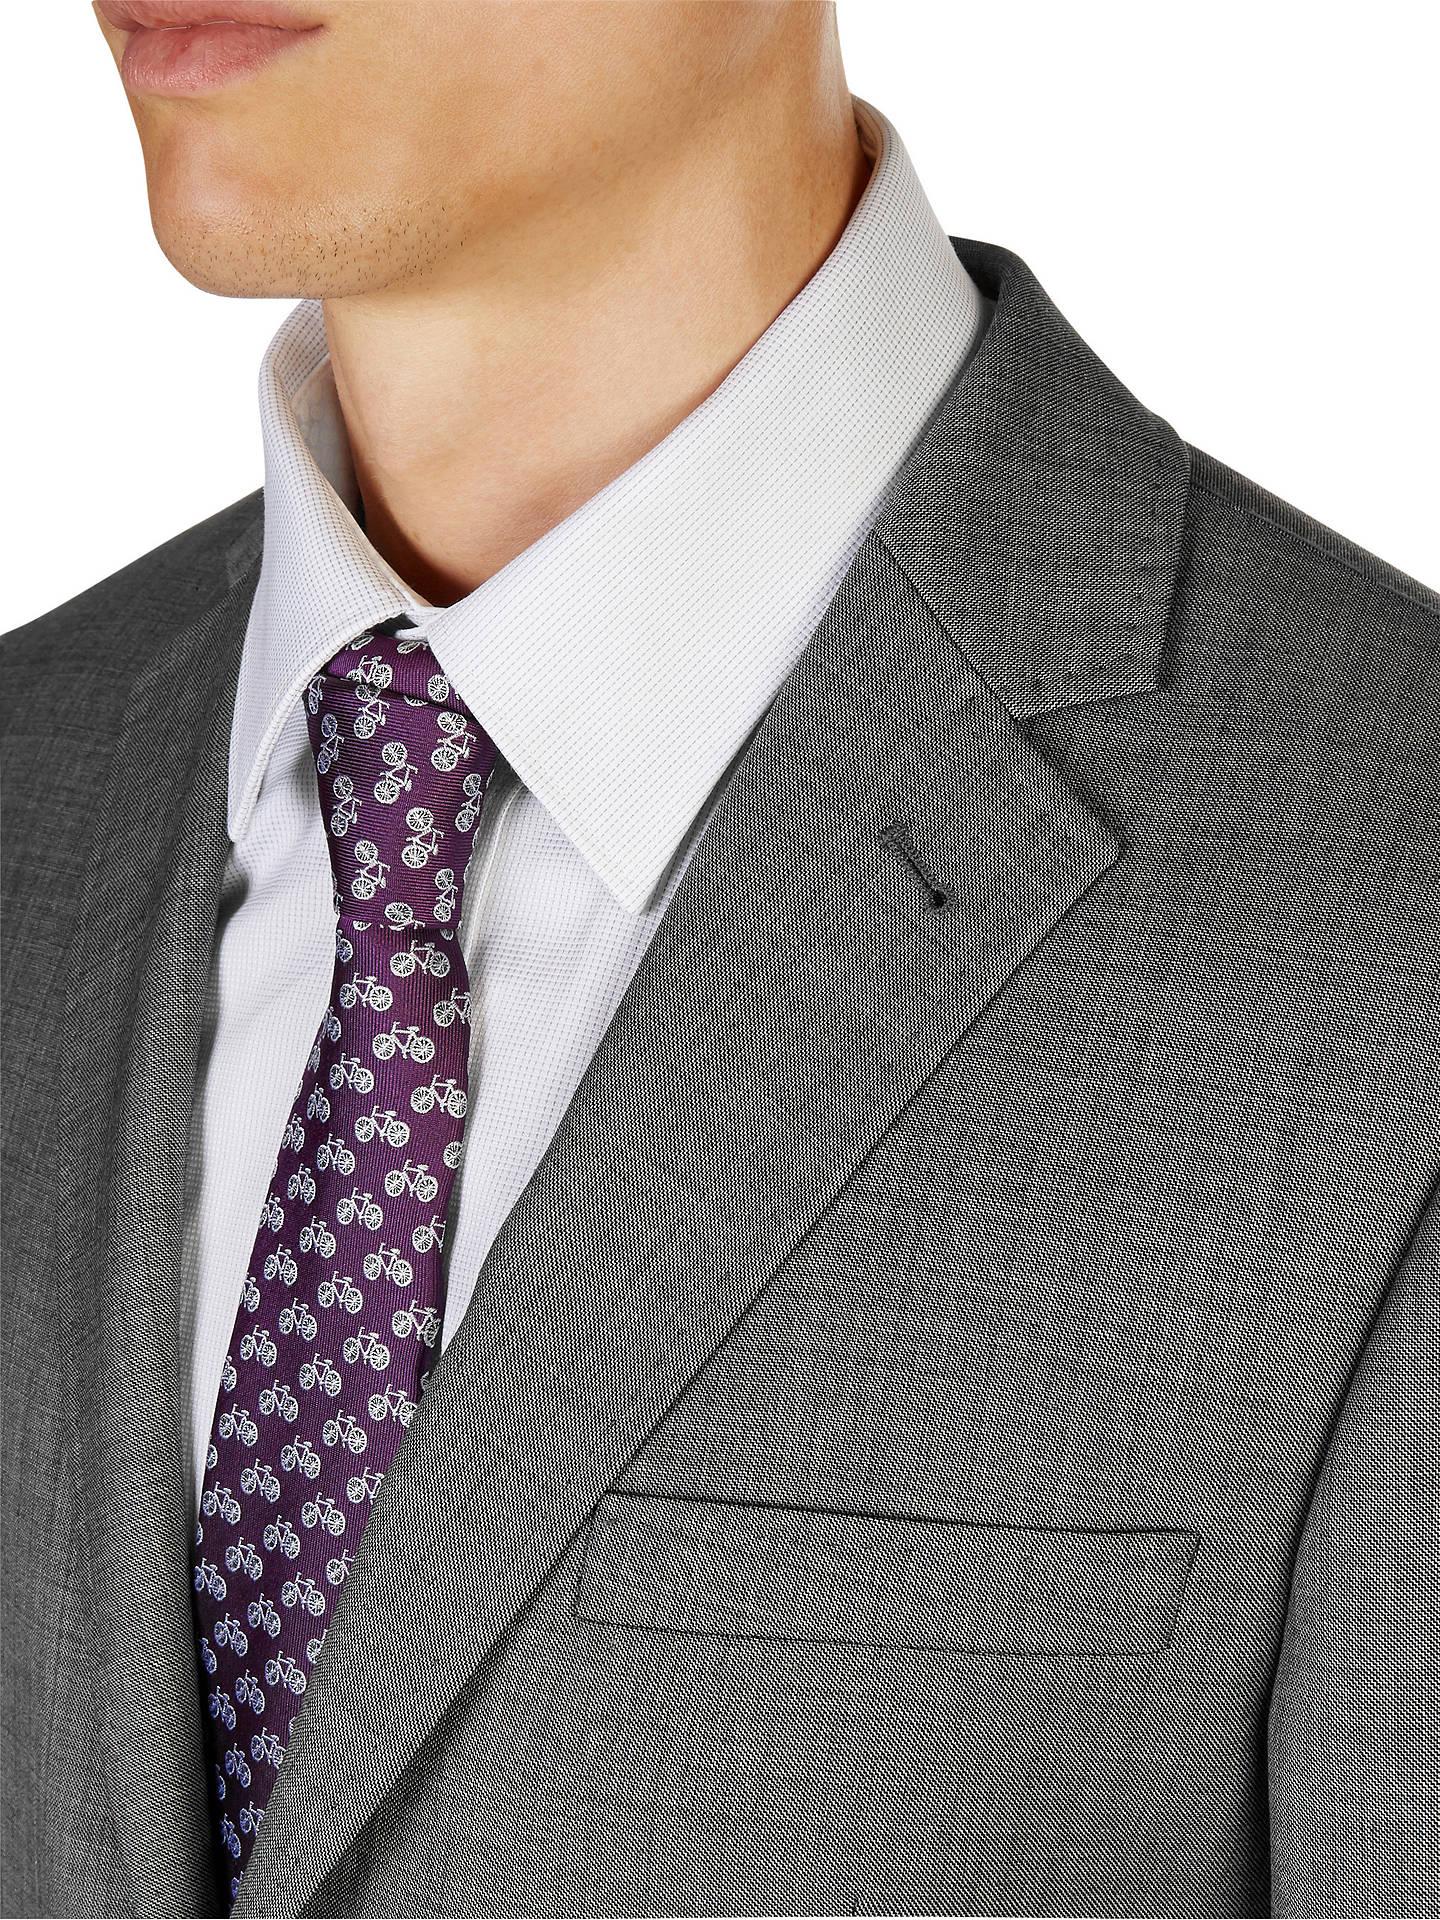 68fdb1c9fa6b ... Buy Ted Baker Slashj Sharkskin Wool Tailored Fit Suit Jacket